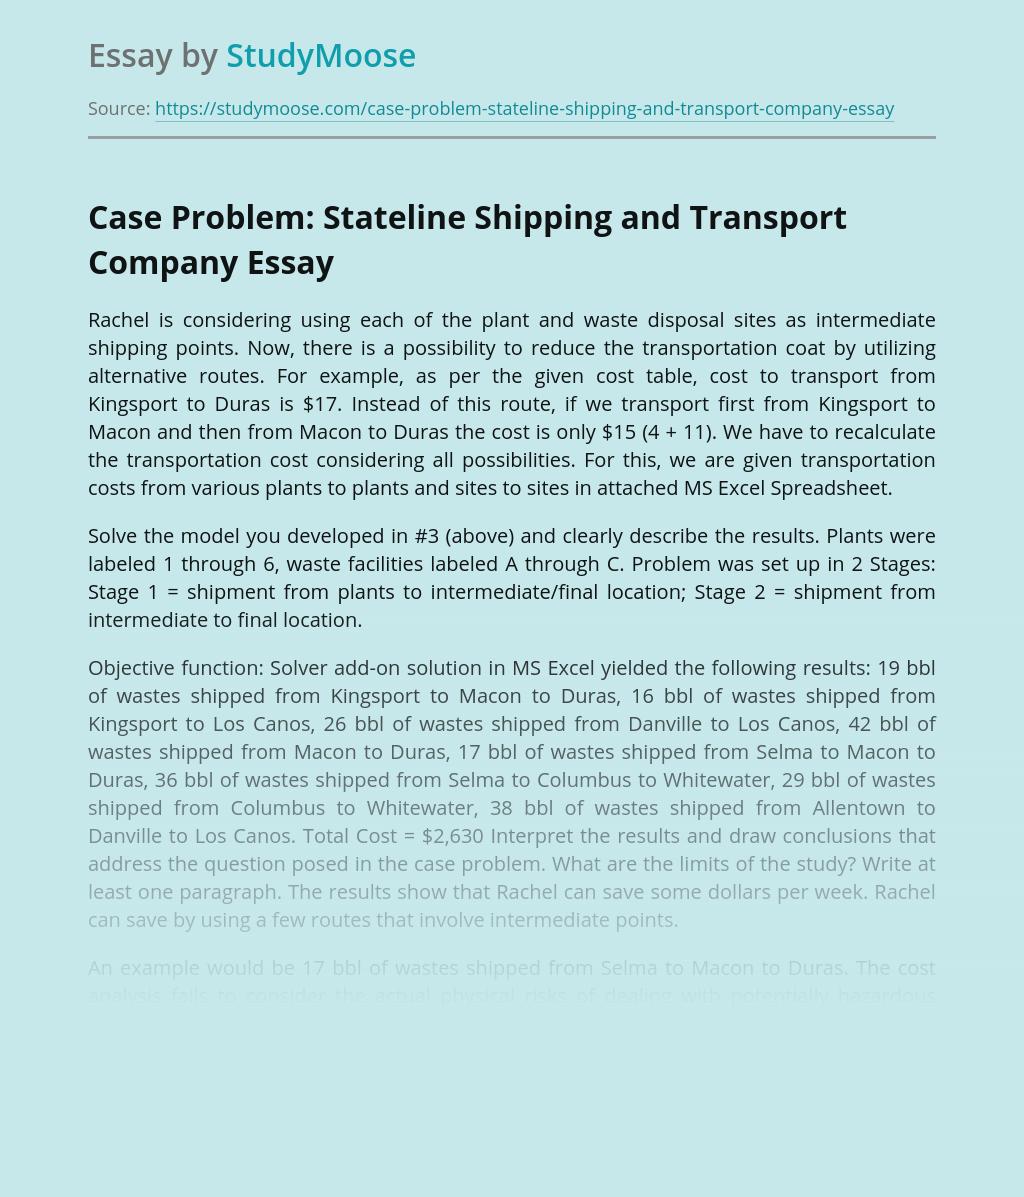 Case Problem: Stateline Shipping and Transport Company